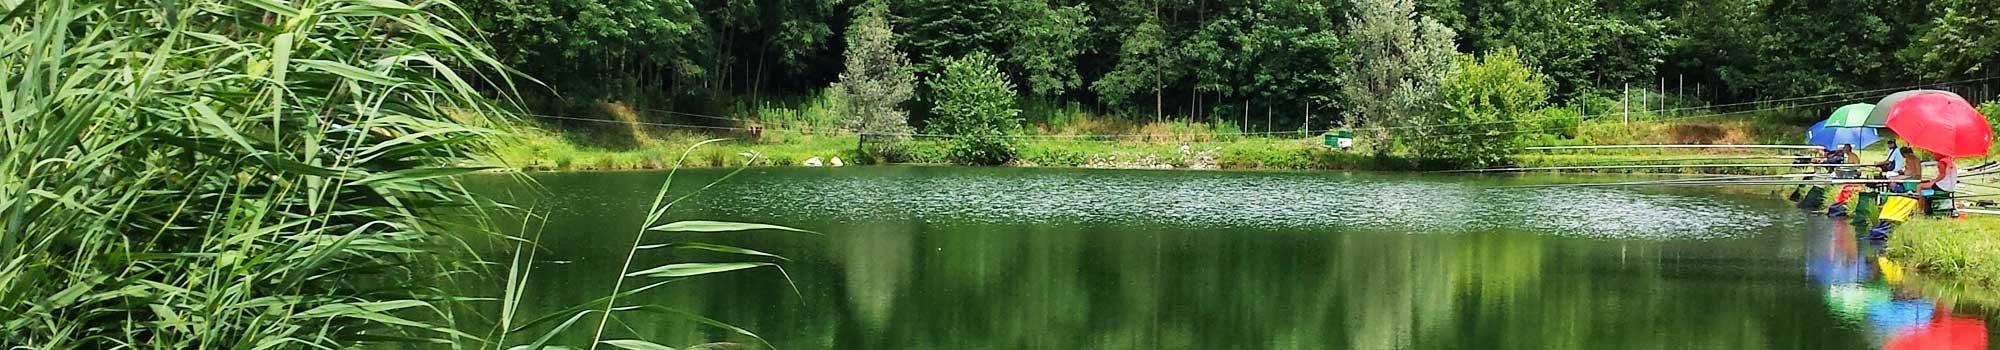 GAM S.n.c., laghi Vita, gare di pesca stagione 2015